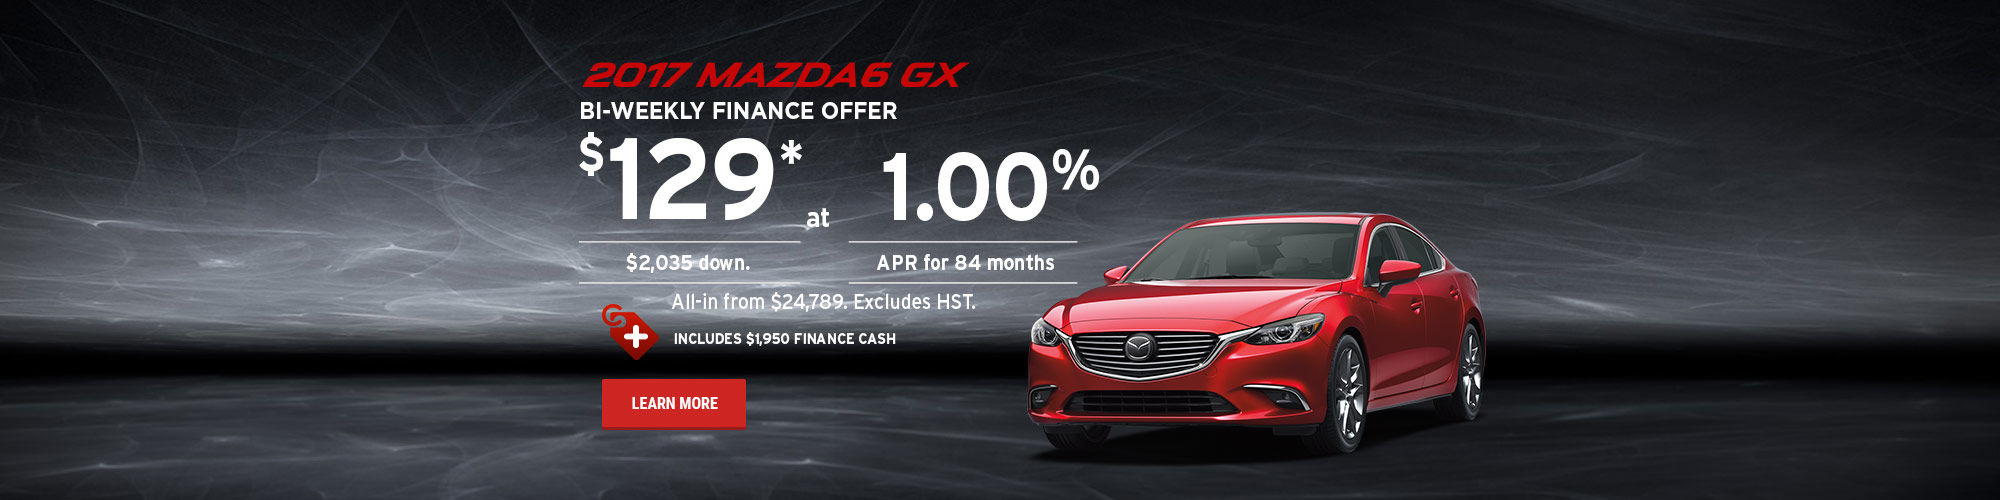 Mazda's Summer Drive Event - M6